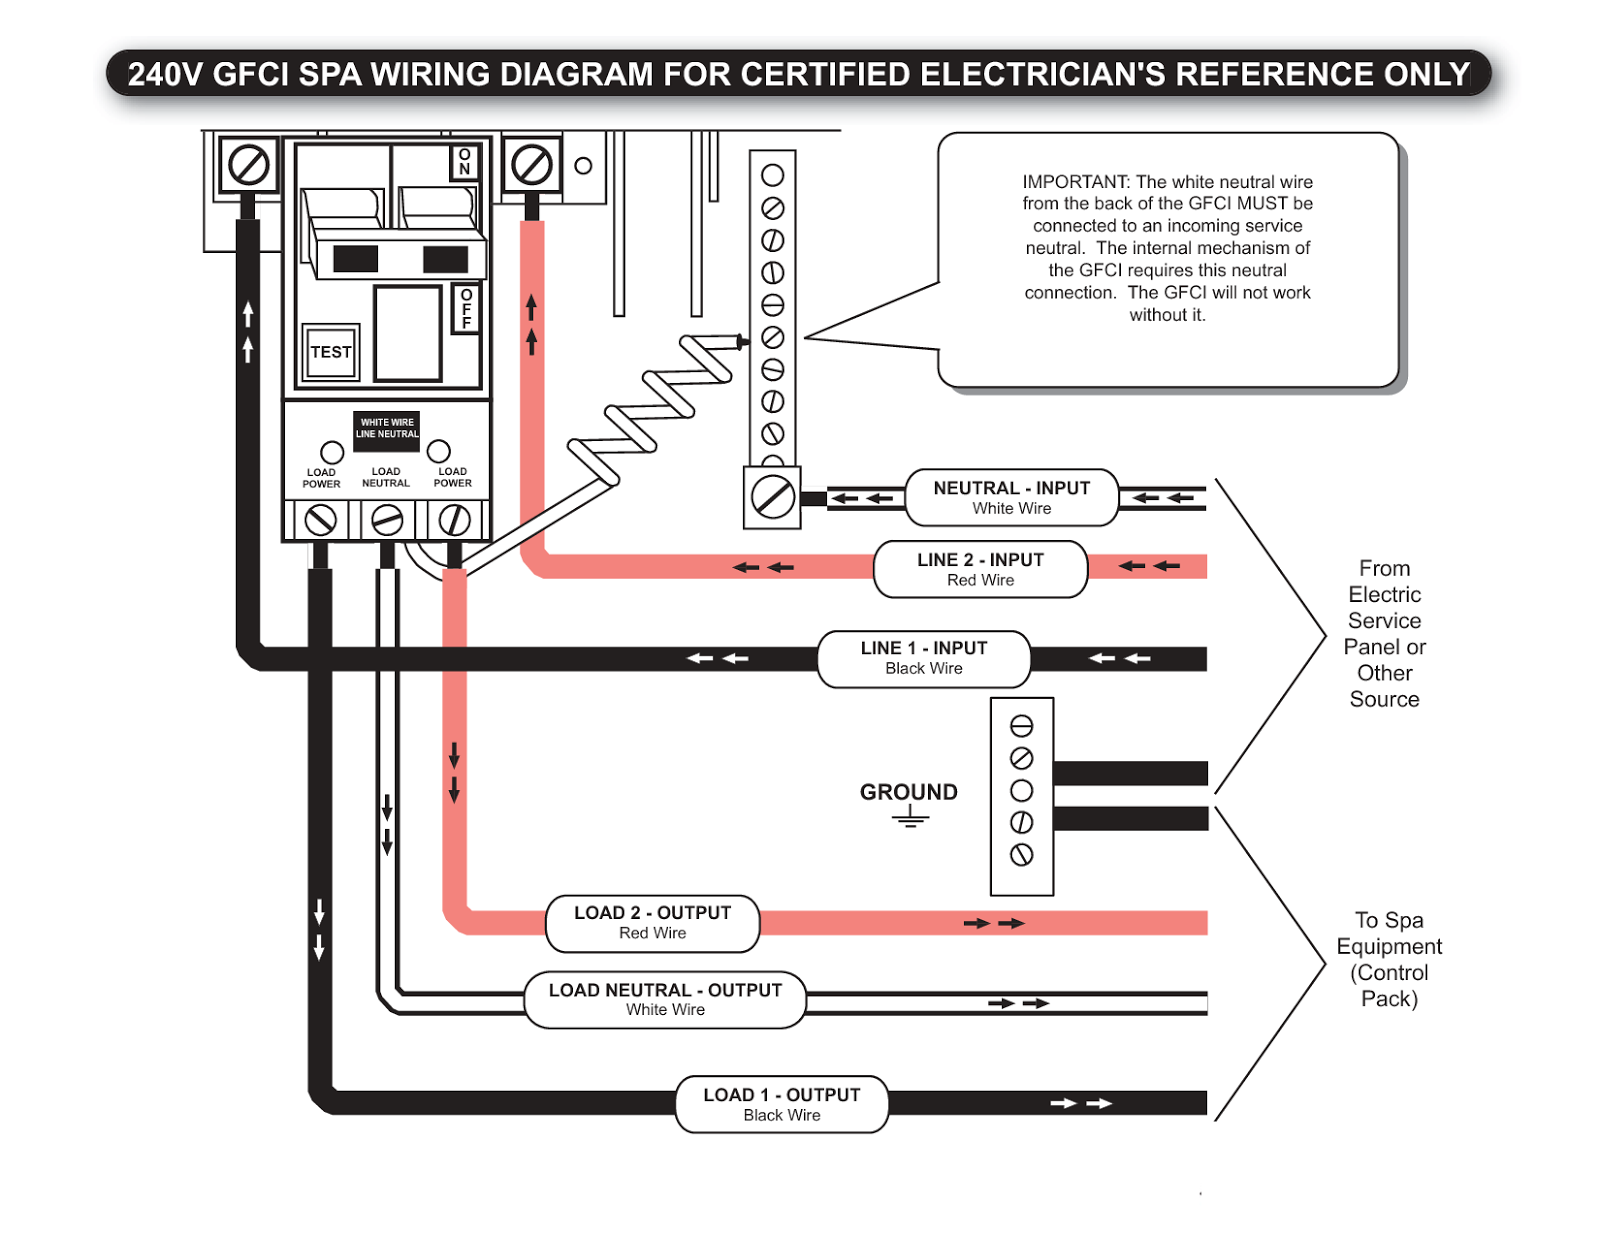 Electric Work: GFCI Wiring Diagram (240 Volt)